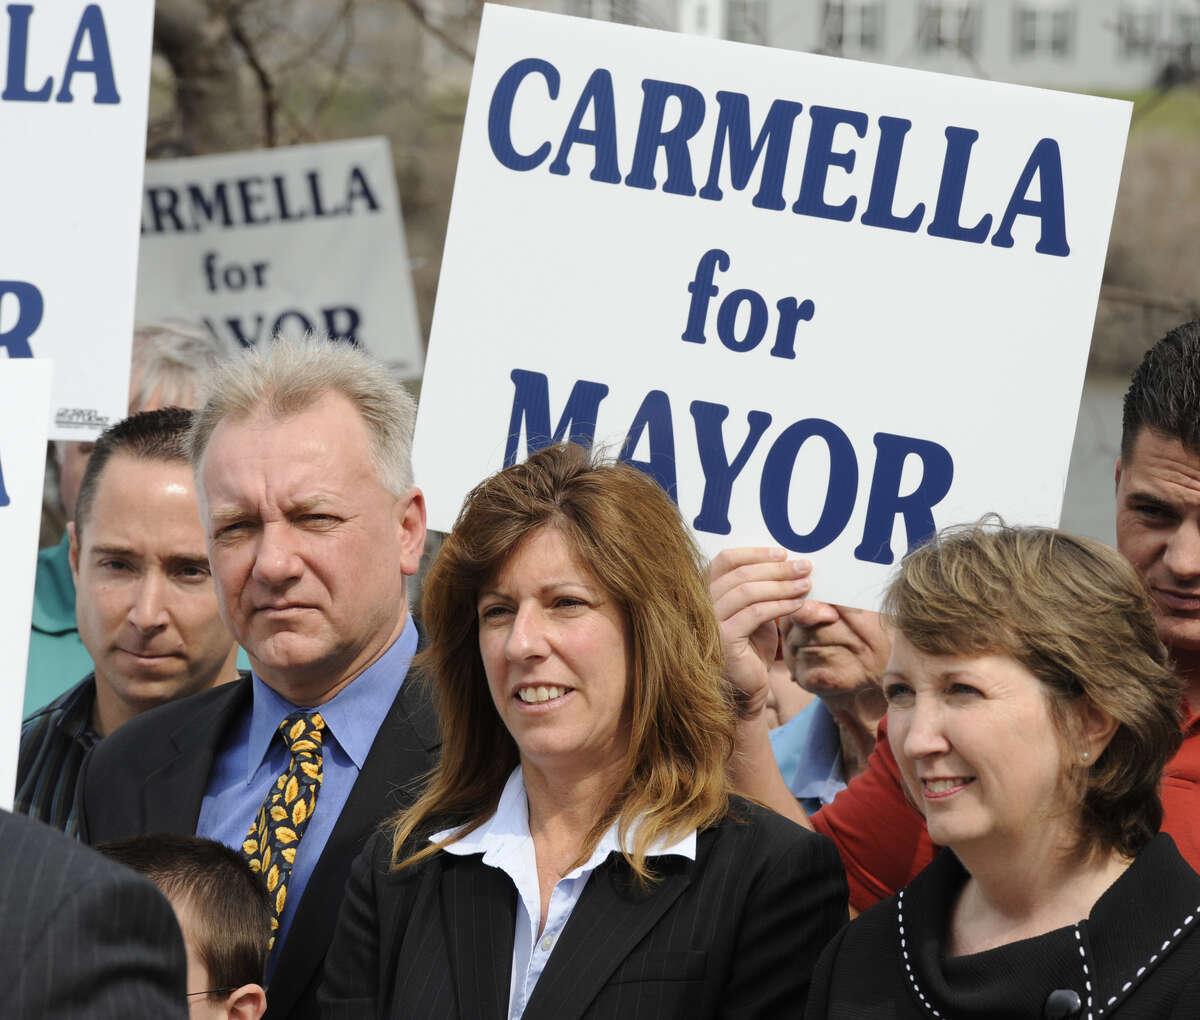 Carmella Mantello kicks off her Troy, N.Y. mayoral campaign in 2011. . (Skip Dickstein / Times Union)